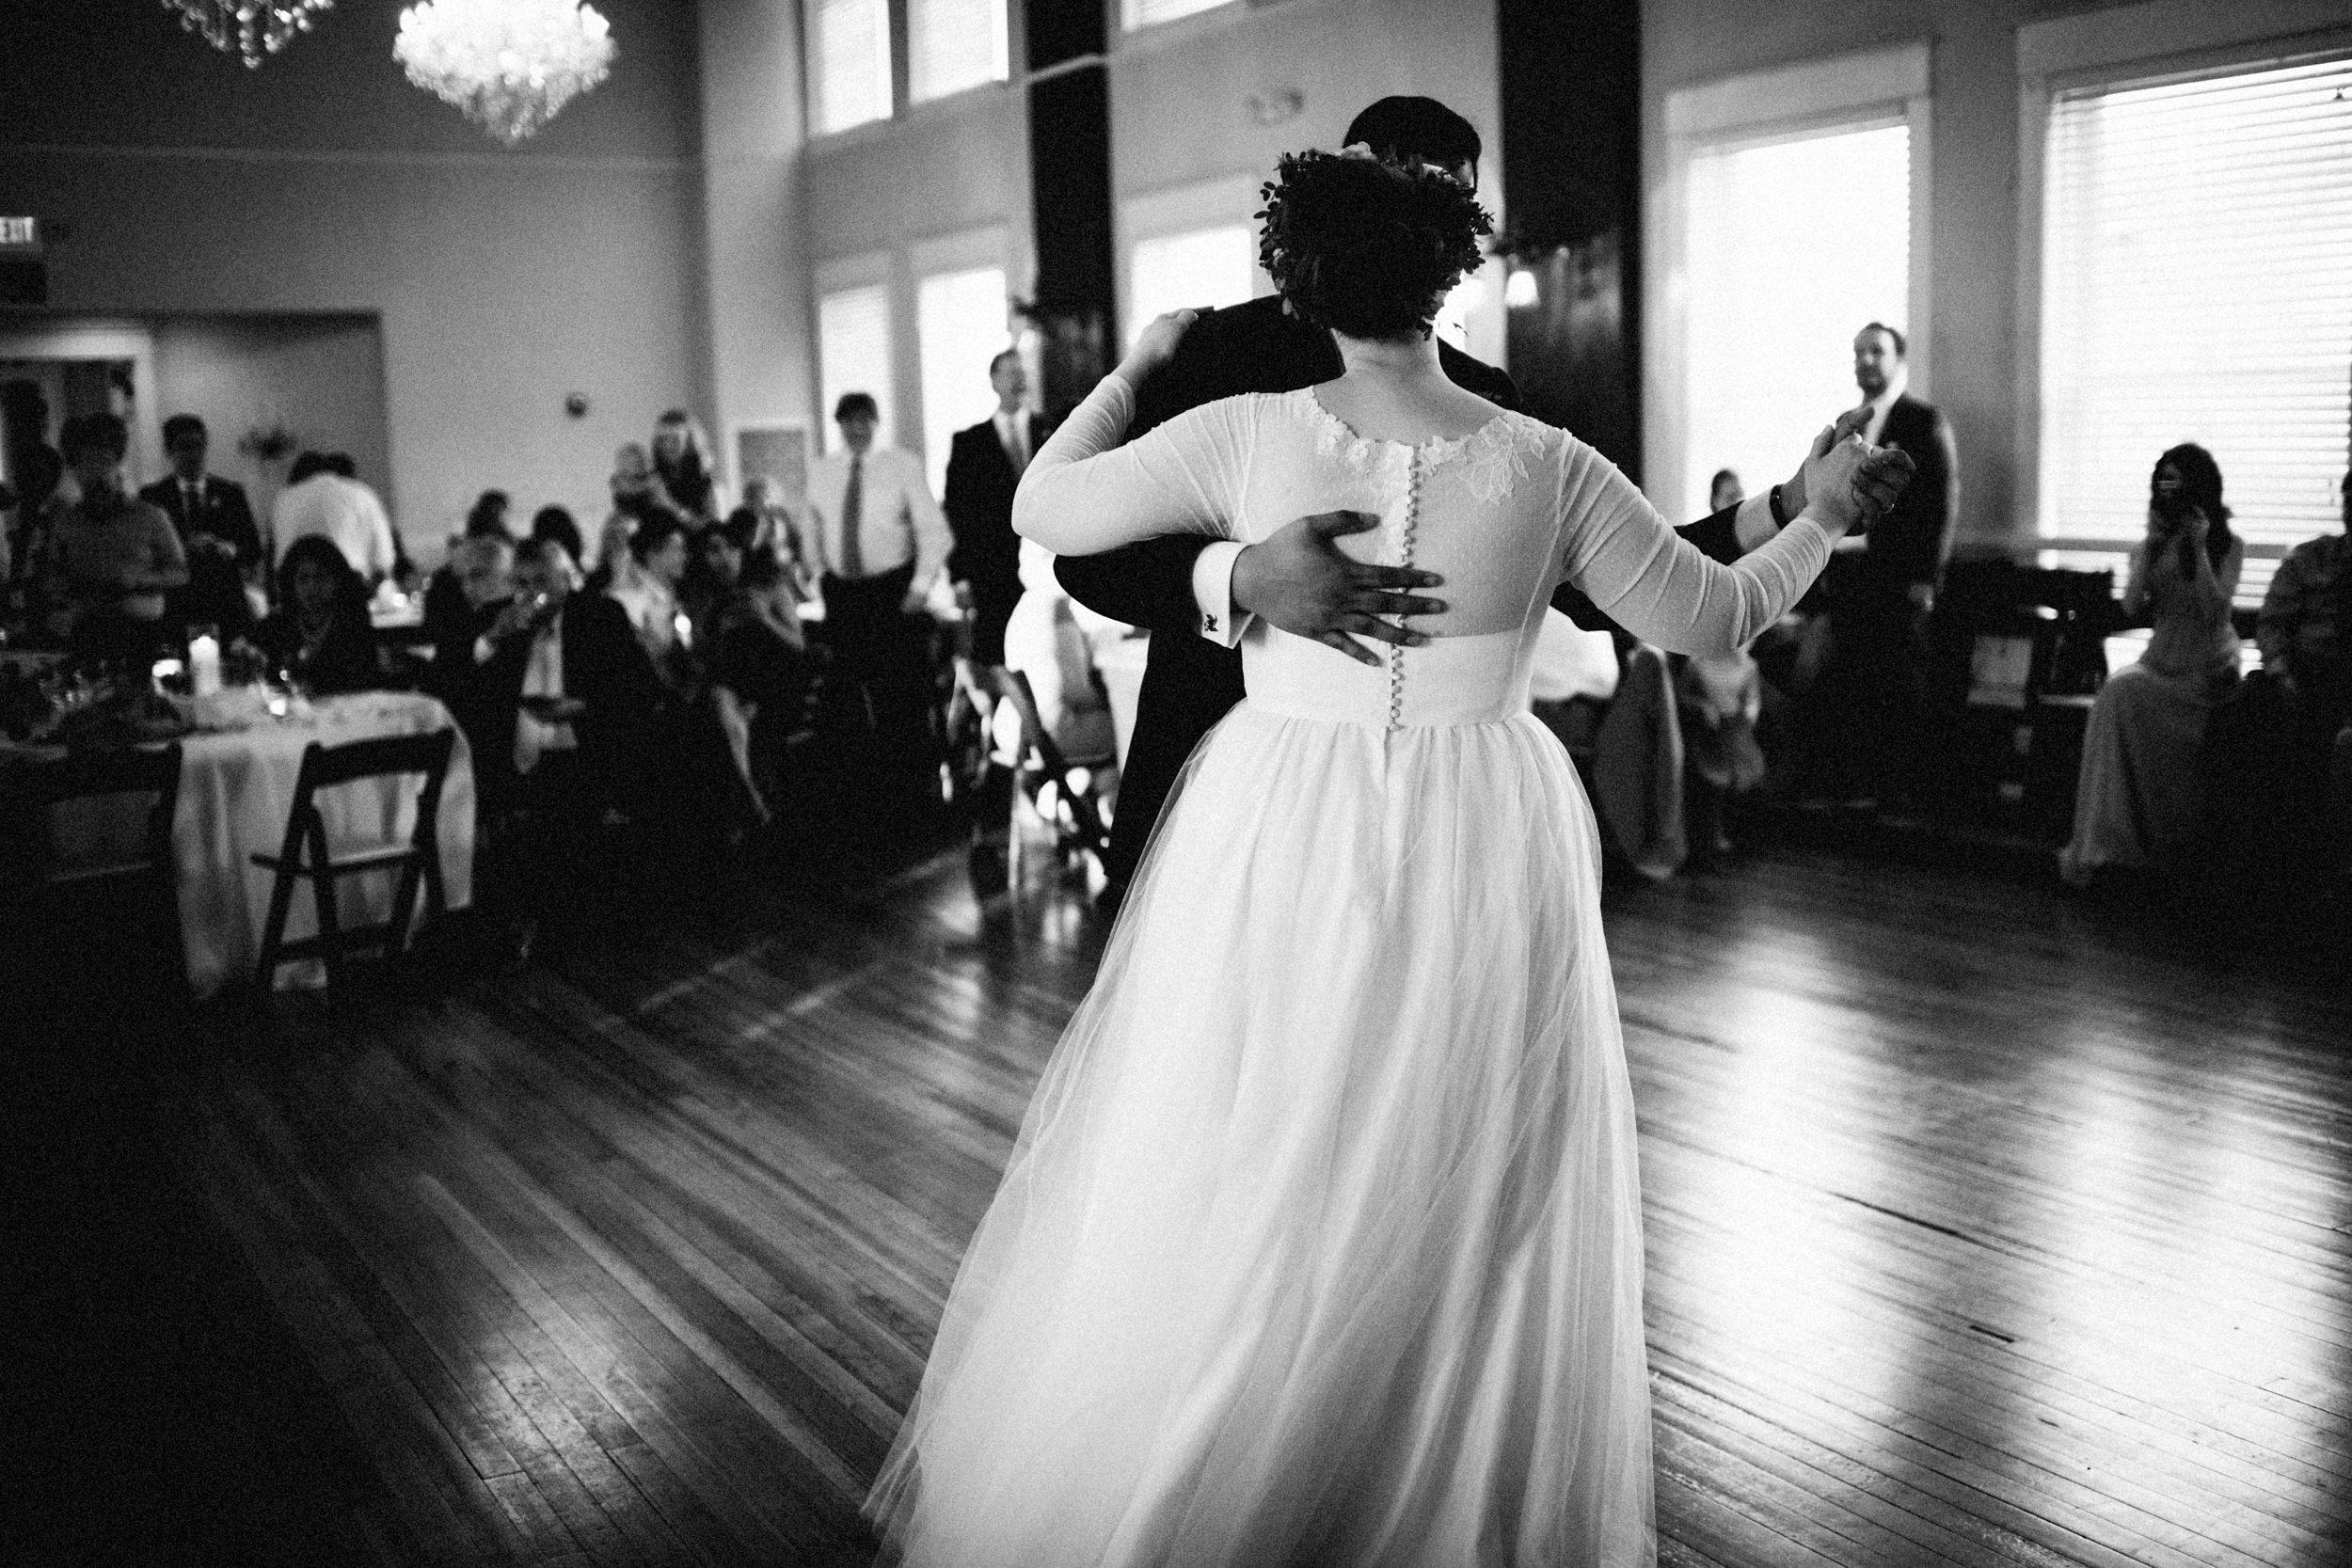 lauren-dean-wedding-grand-lodge-kentucky-sarah-katherine-davis-photography-561edit.jpg